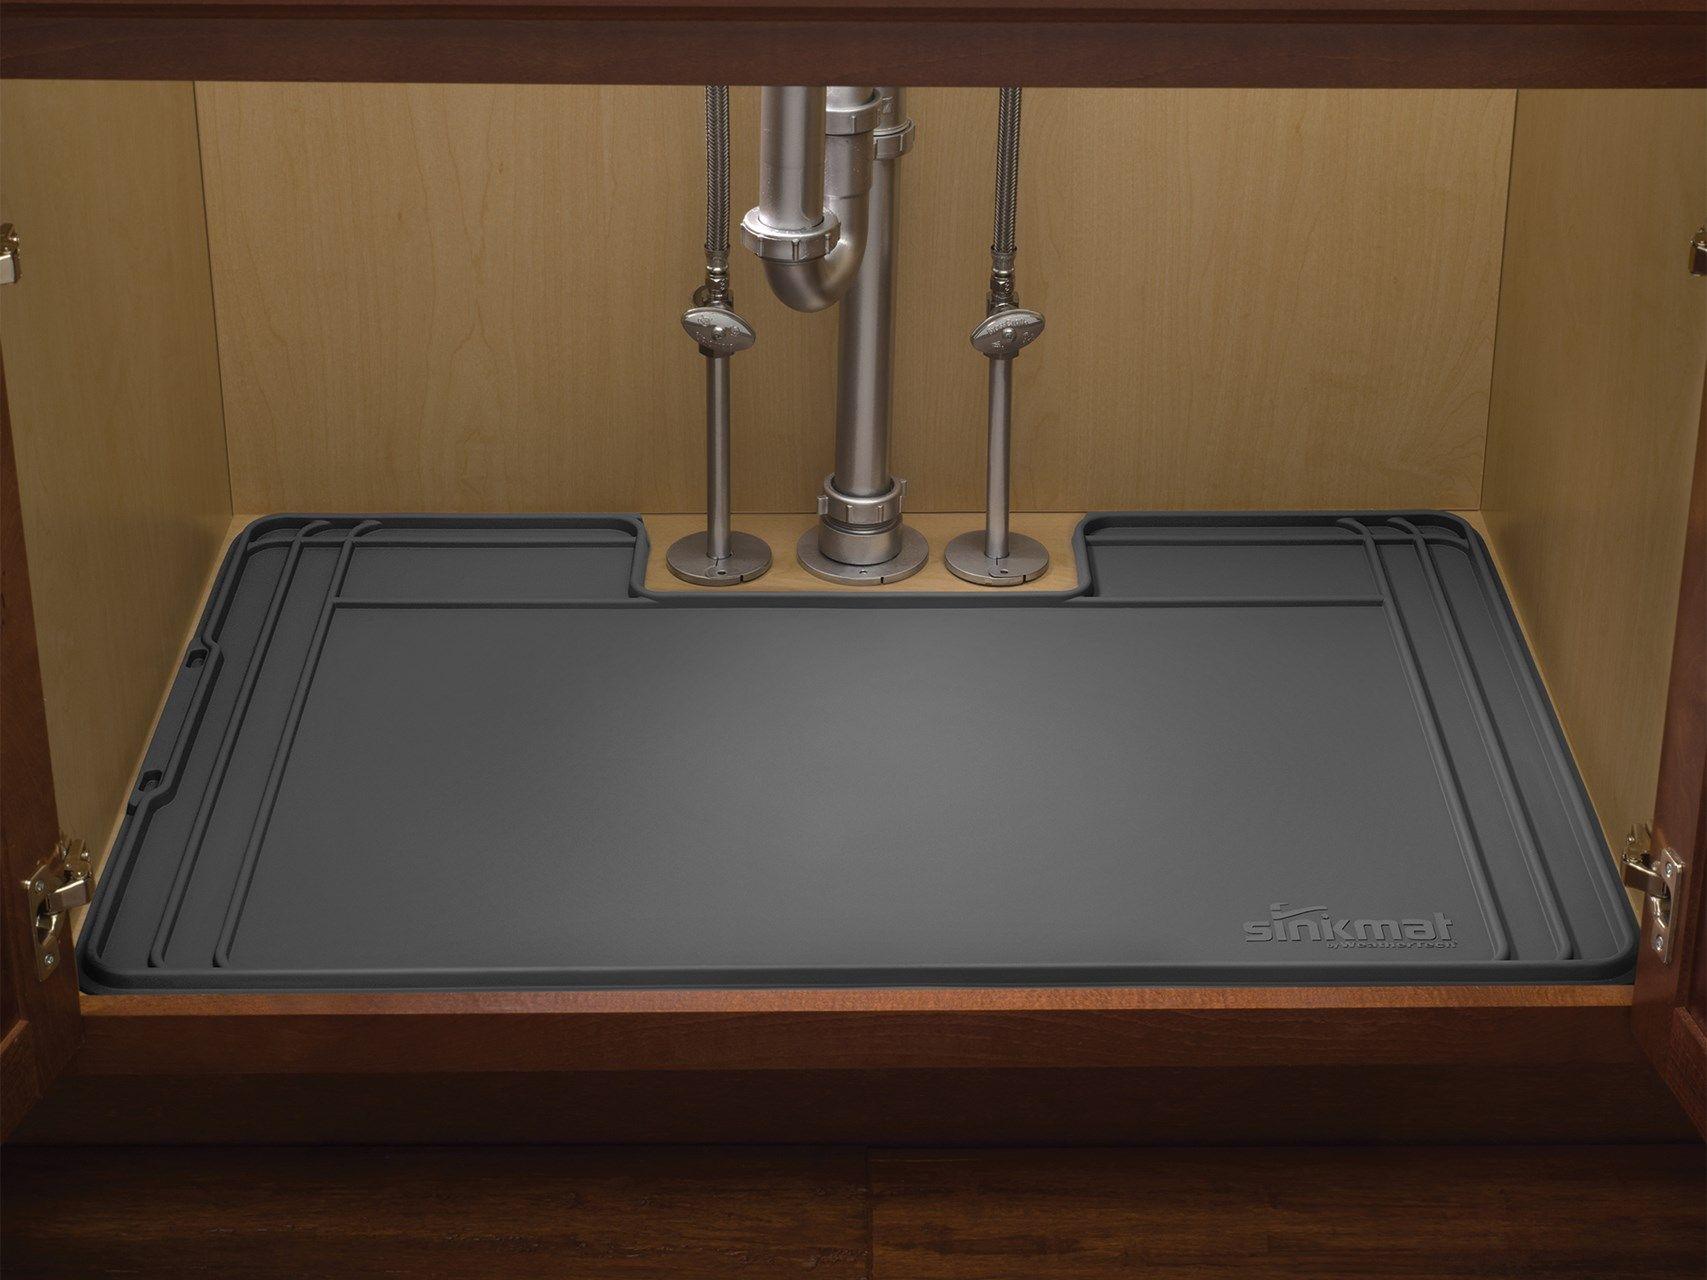 Weathertech Sinkmat Under The Sink Cabinet Protection Mat Weathertech Sink Mats Sink Sink Cabinet [ 1280 x 1707 Pixel ]